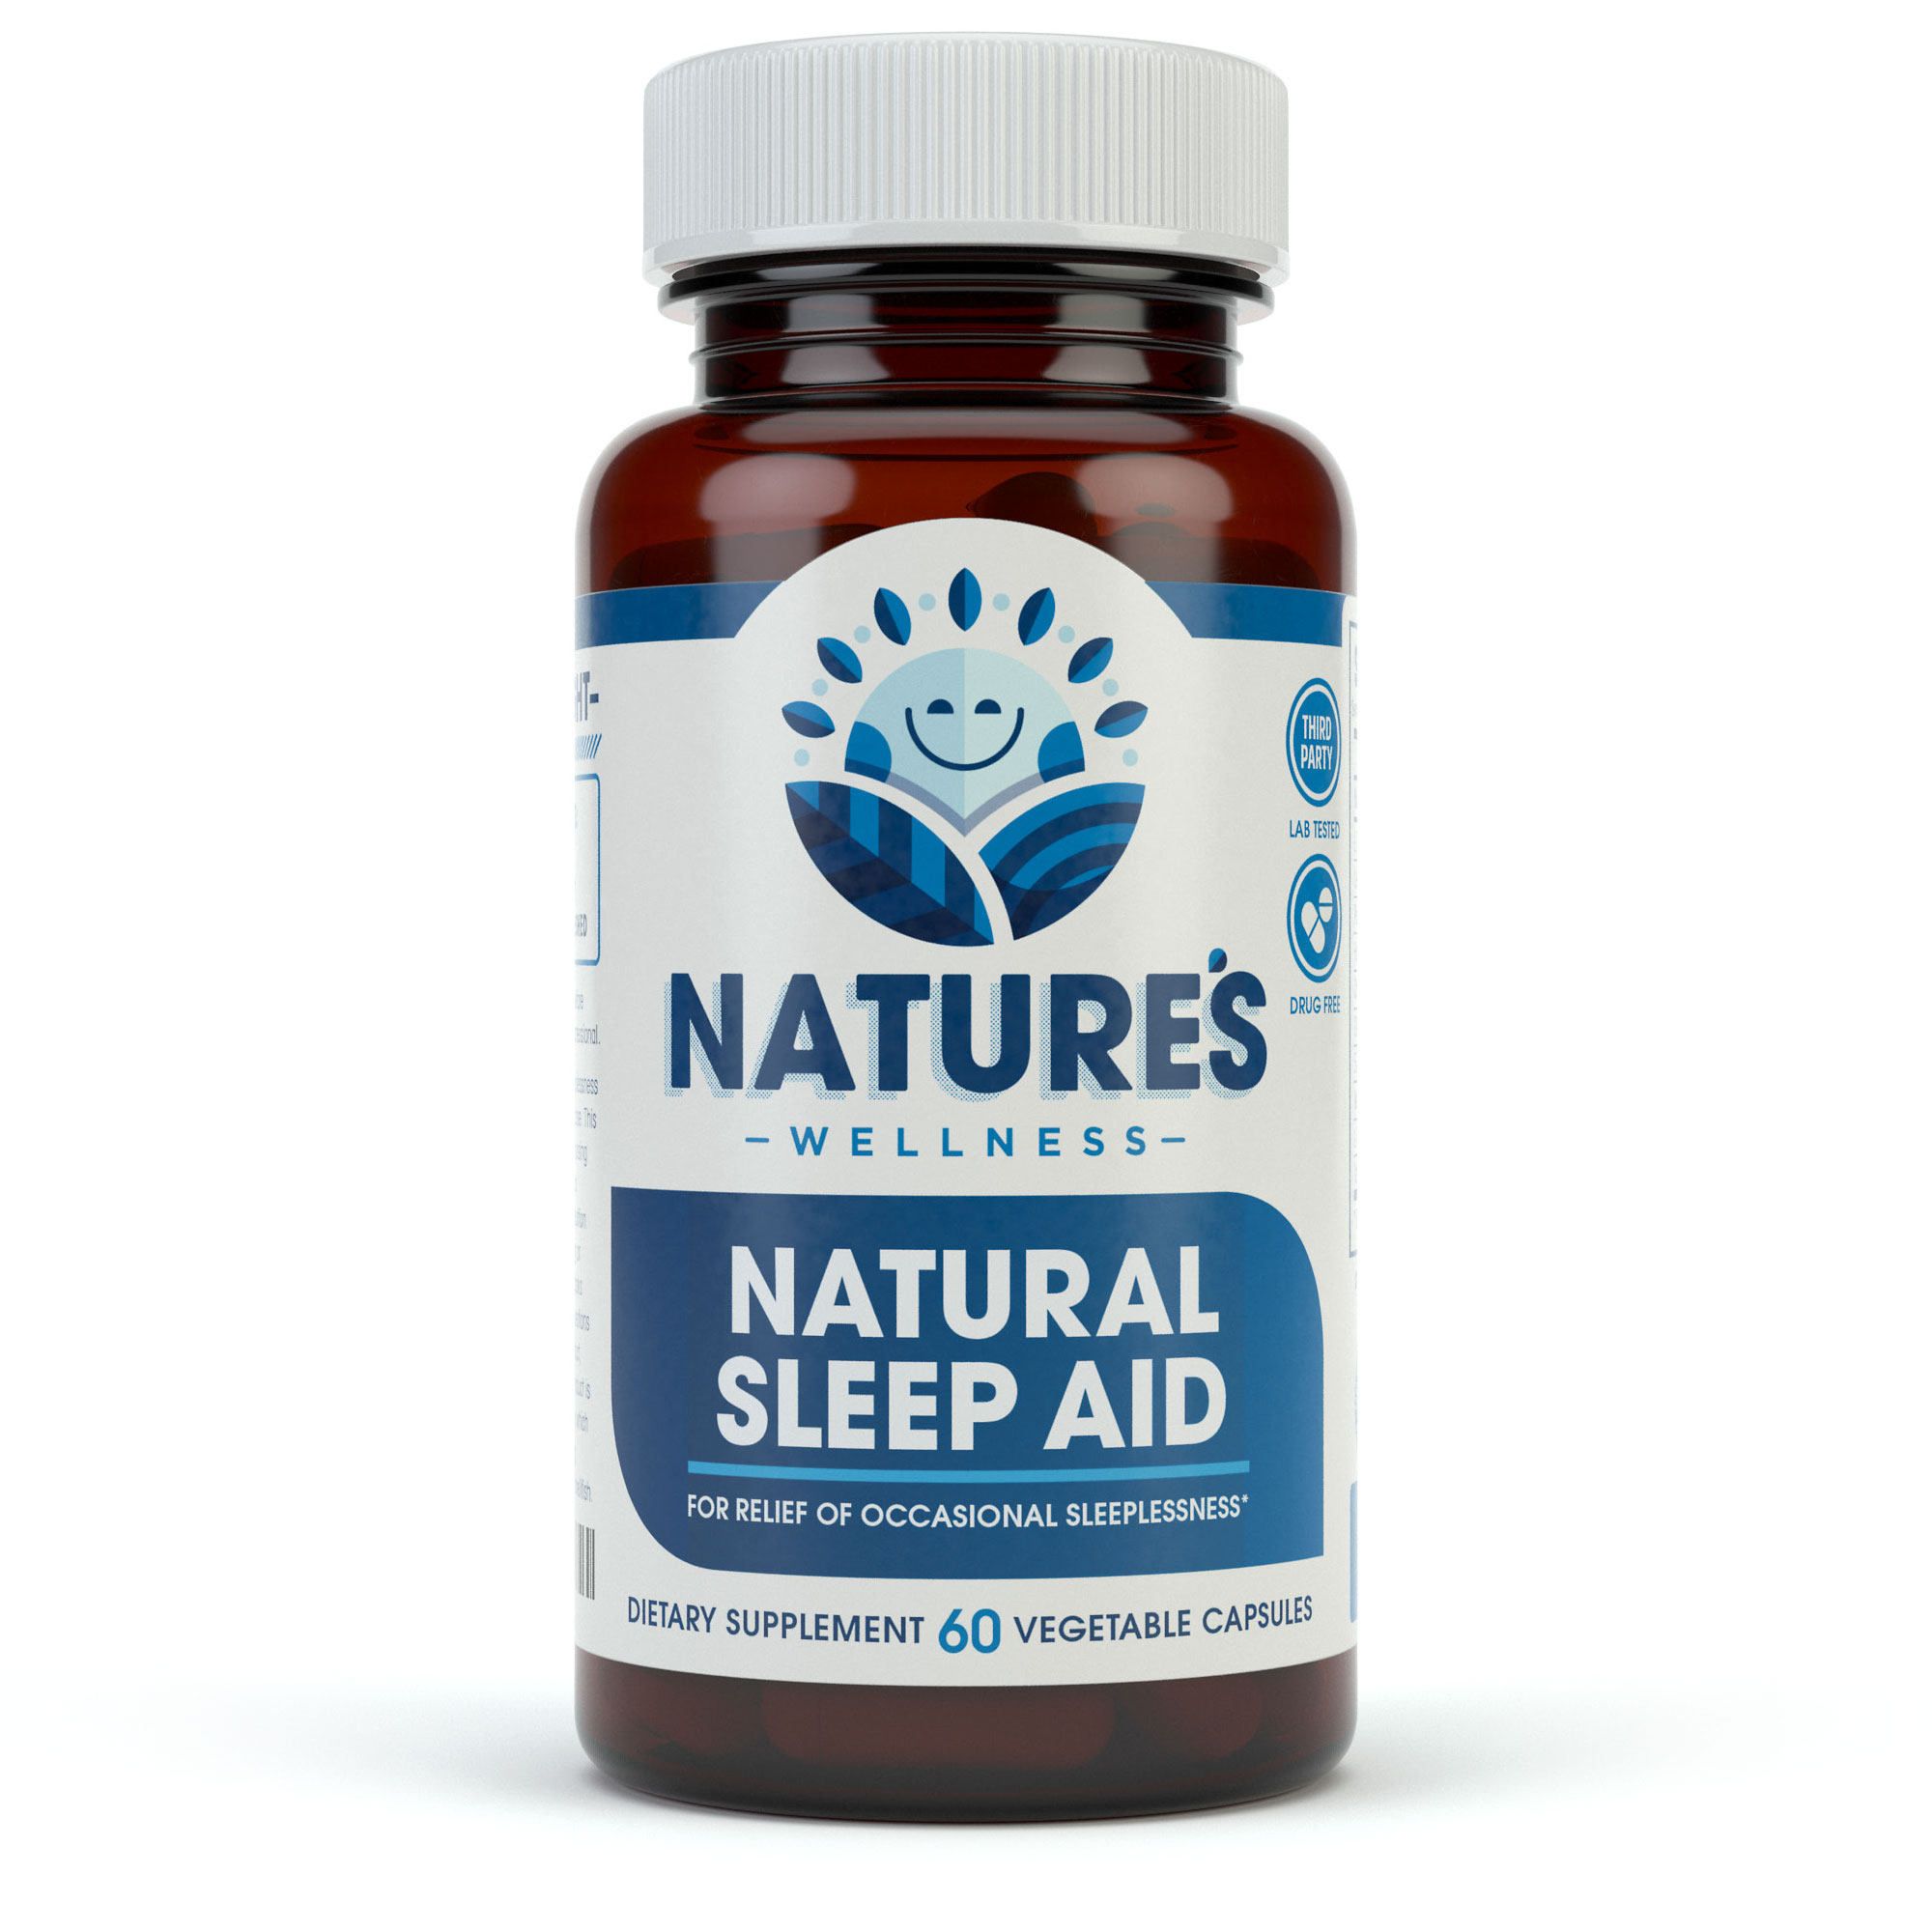 Natural-Sleep-Aid-60-Front-2K.jpg